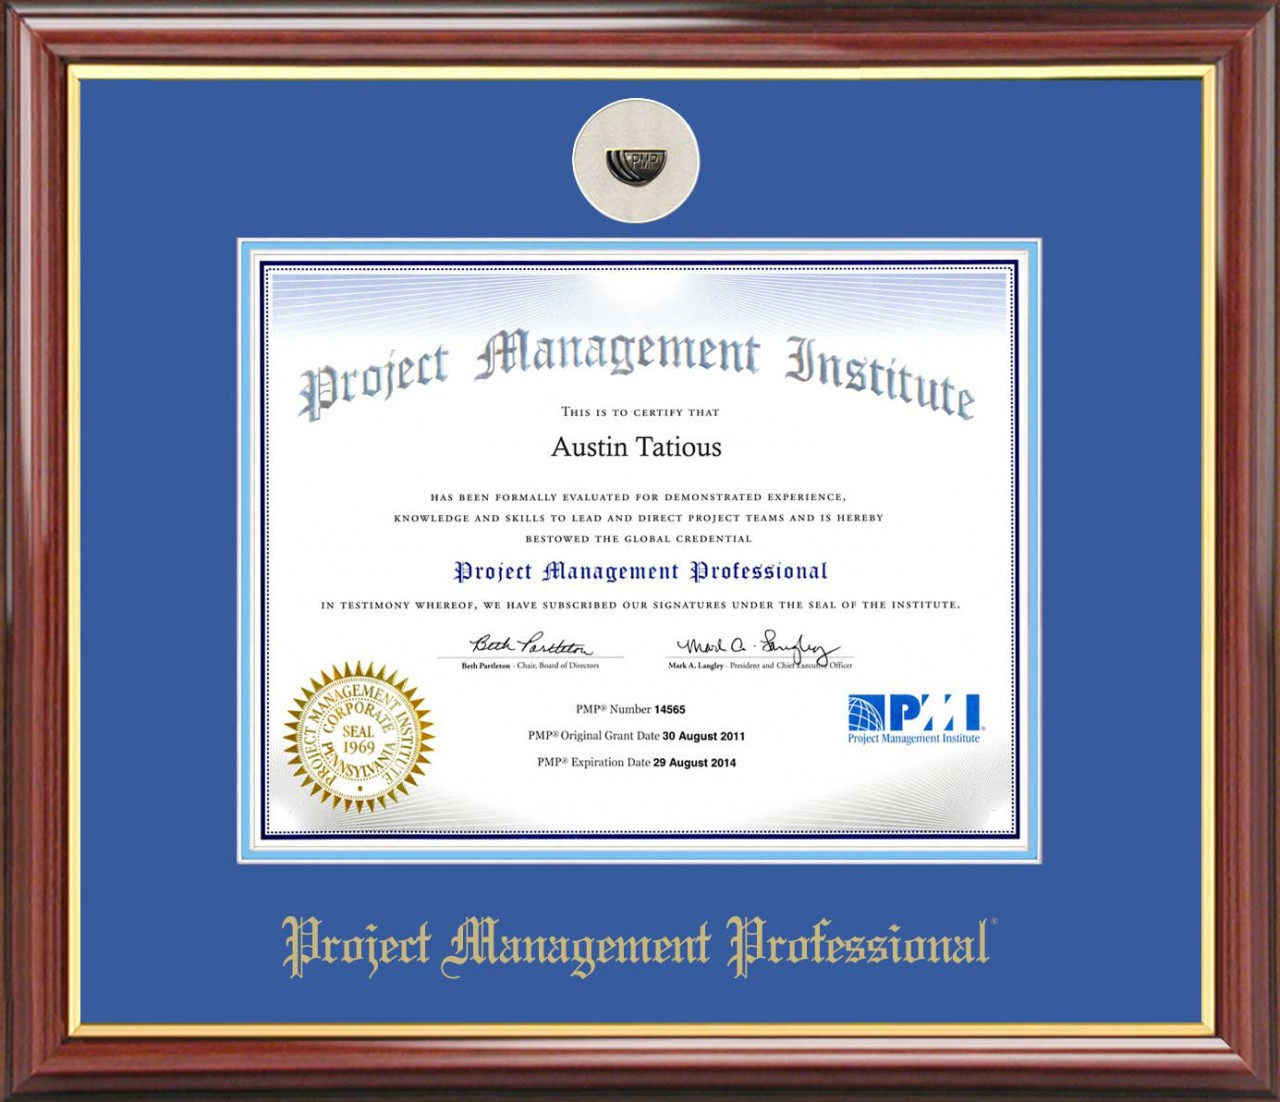 Pmp 174 Certificate Frame Mahogany With Royal Mat Amp Lapel Pin